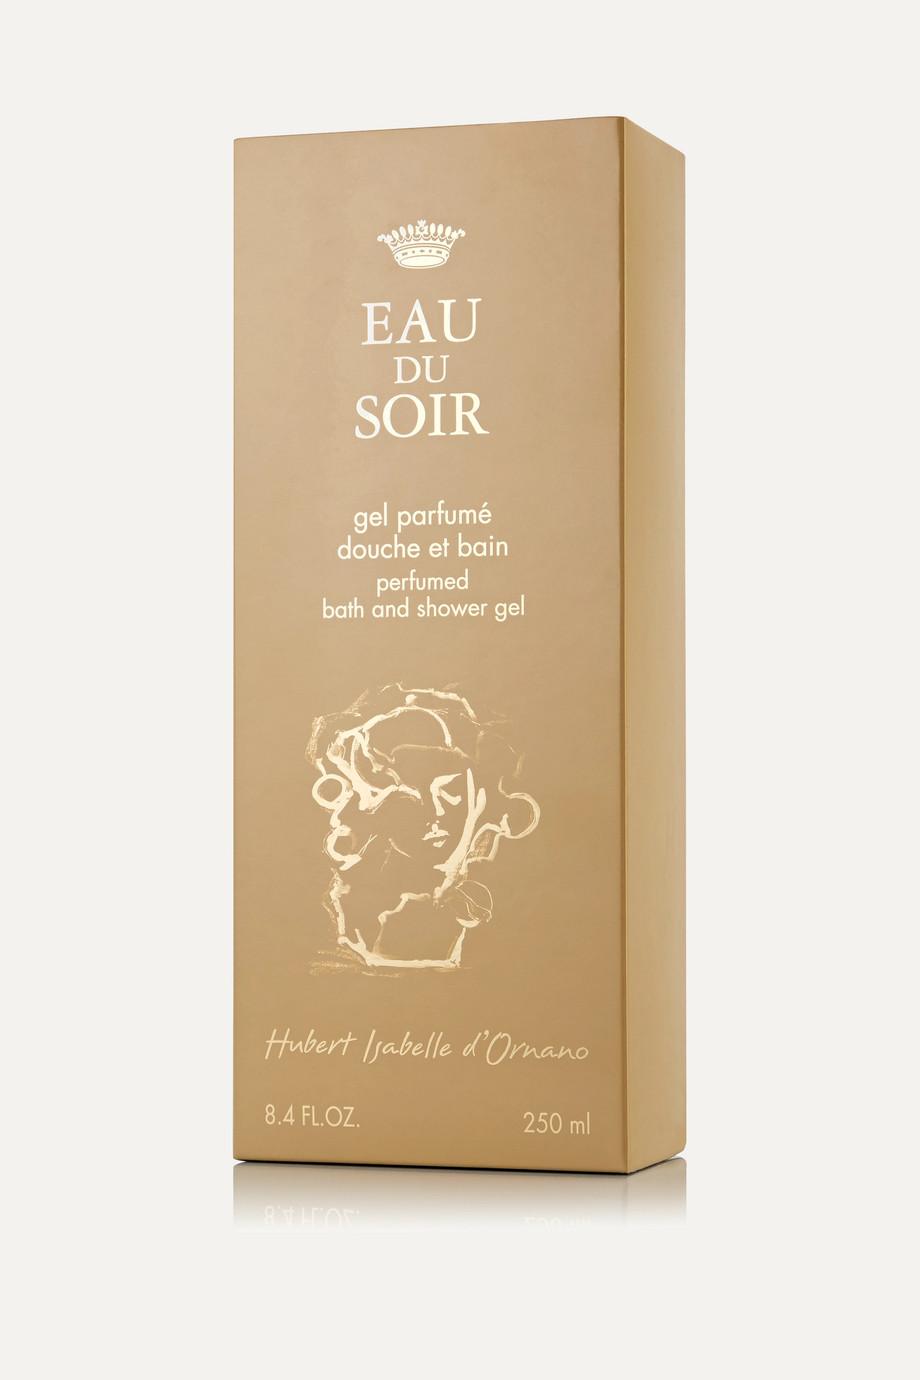 Sisley Gel parfumé douche et bain, Eau du soir, 250 ml